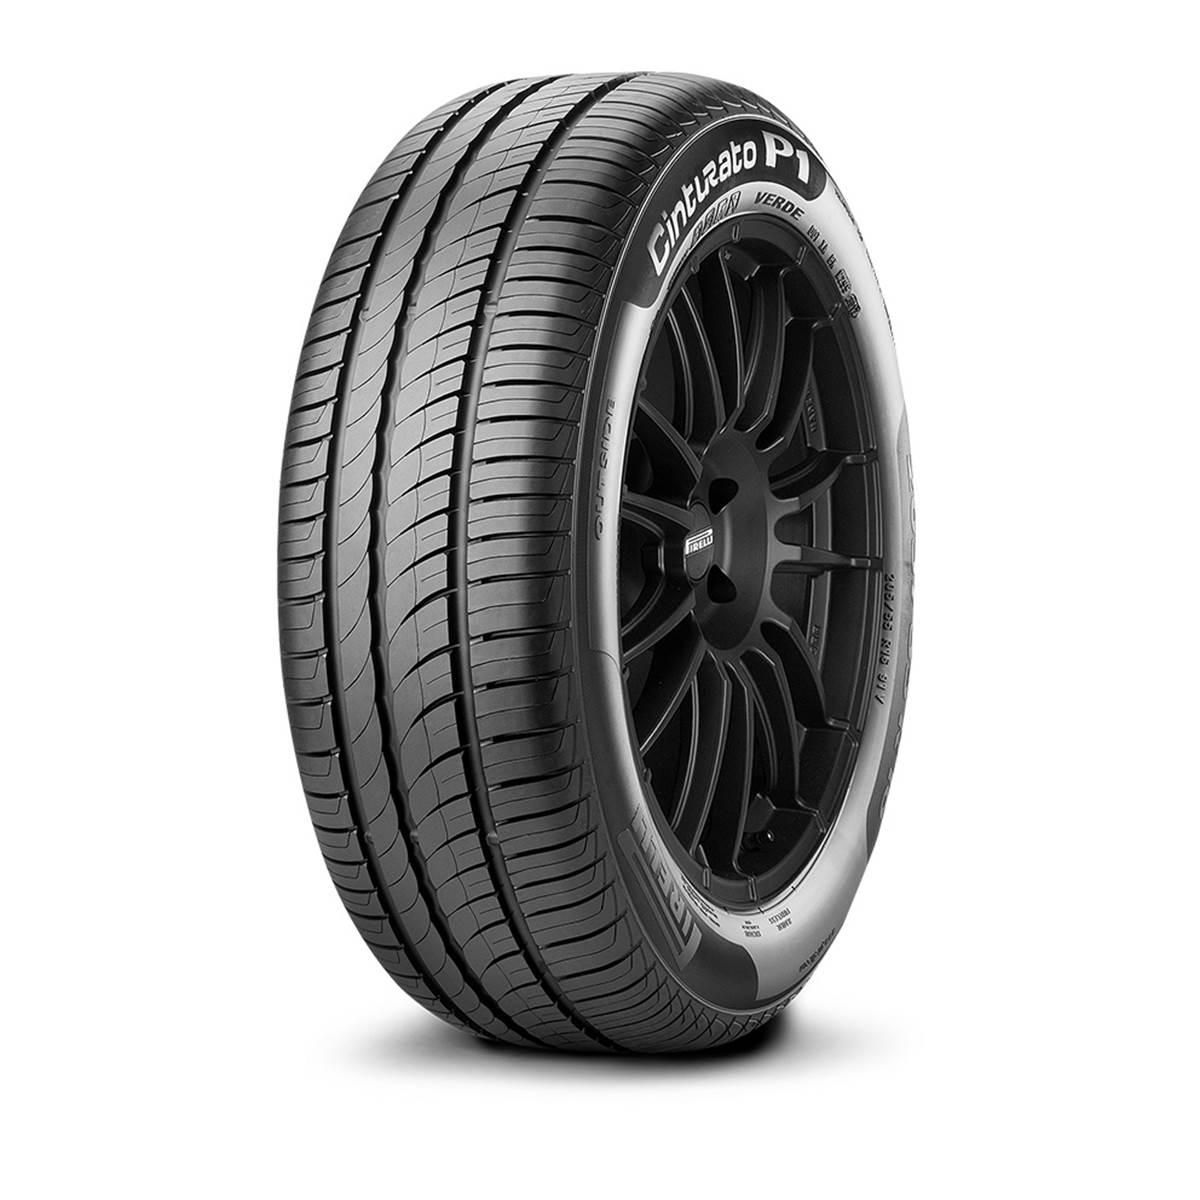 Pneu Pirelli 205/65R15 94T Cinturato P1 Verde